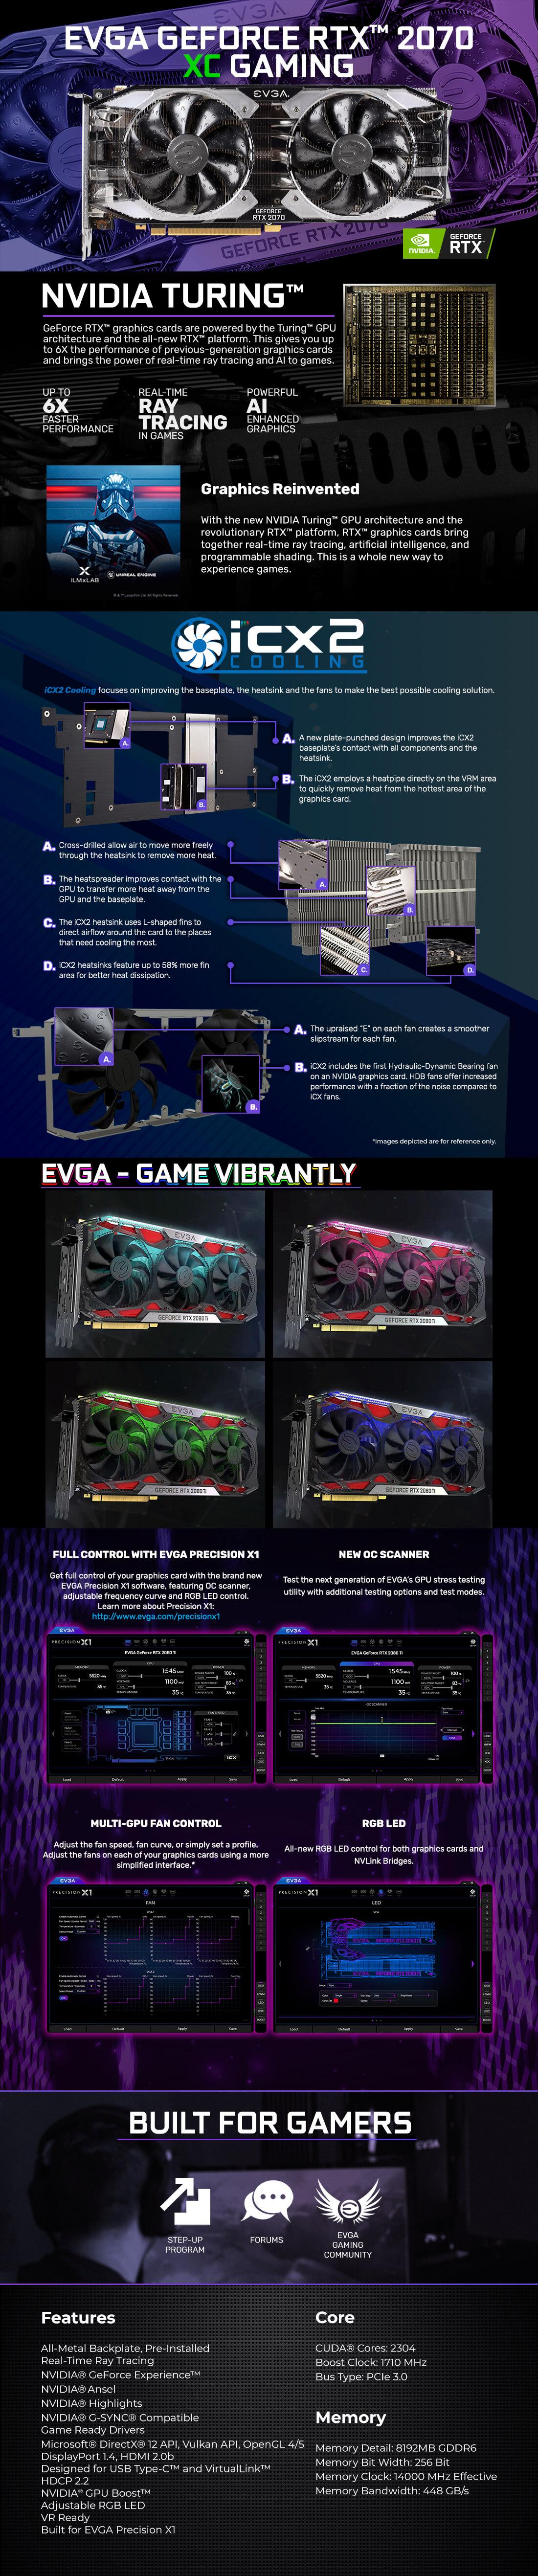 EVGA GeForce RTX 2070 XC Gaming 8G Graphics Card